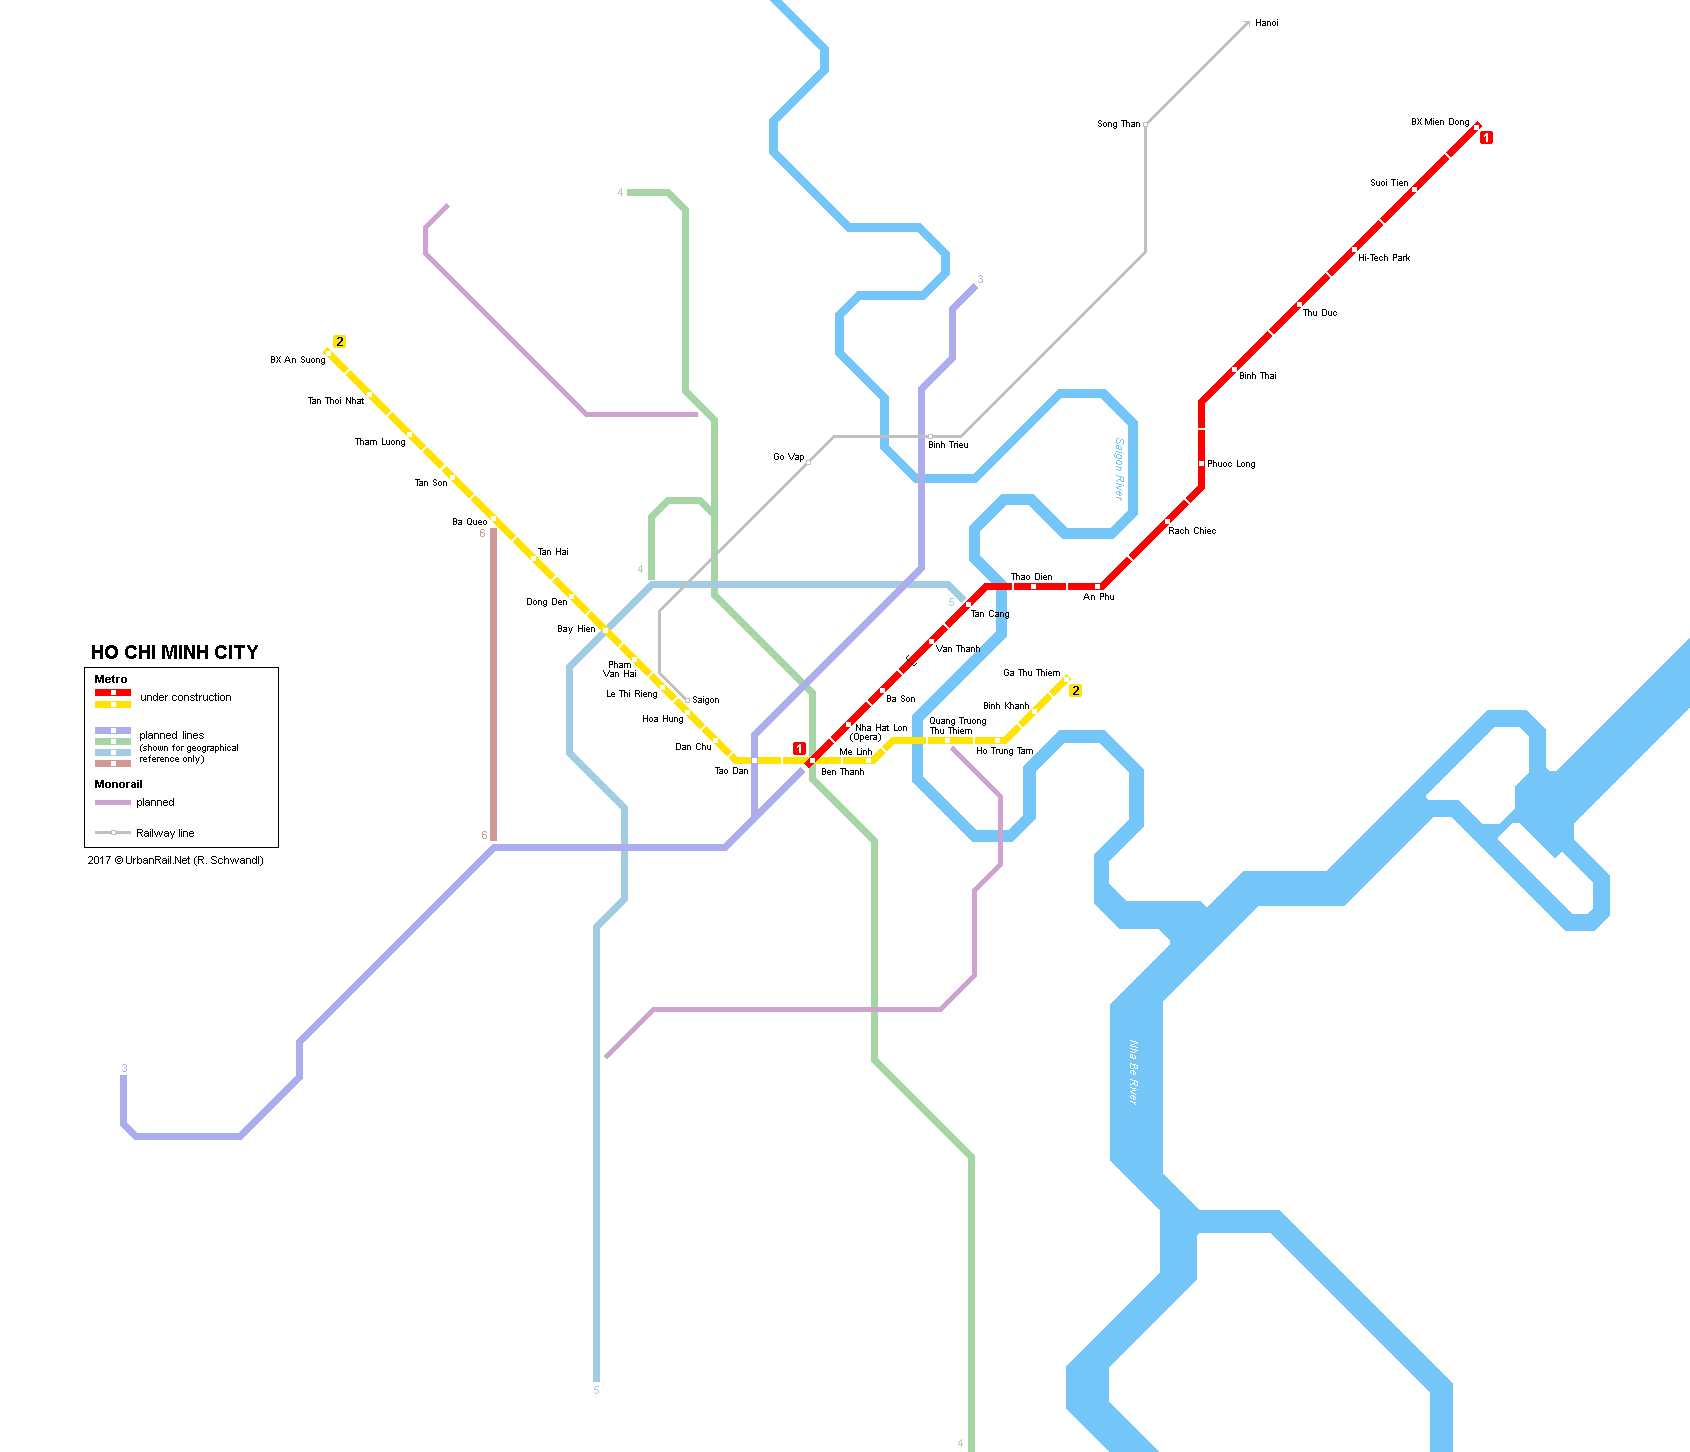 Ho Chi Minh Vietnam Map.Urbanrail Net Asia Vietnam Ho Chi Minh City Metro